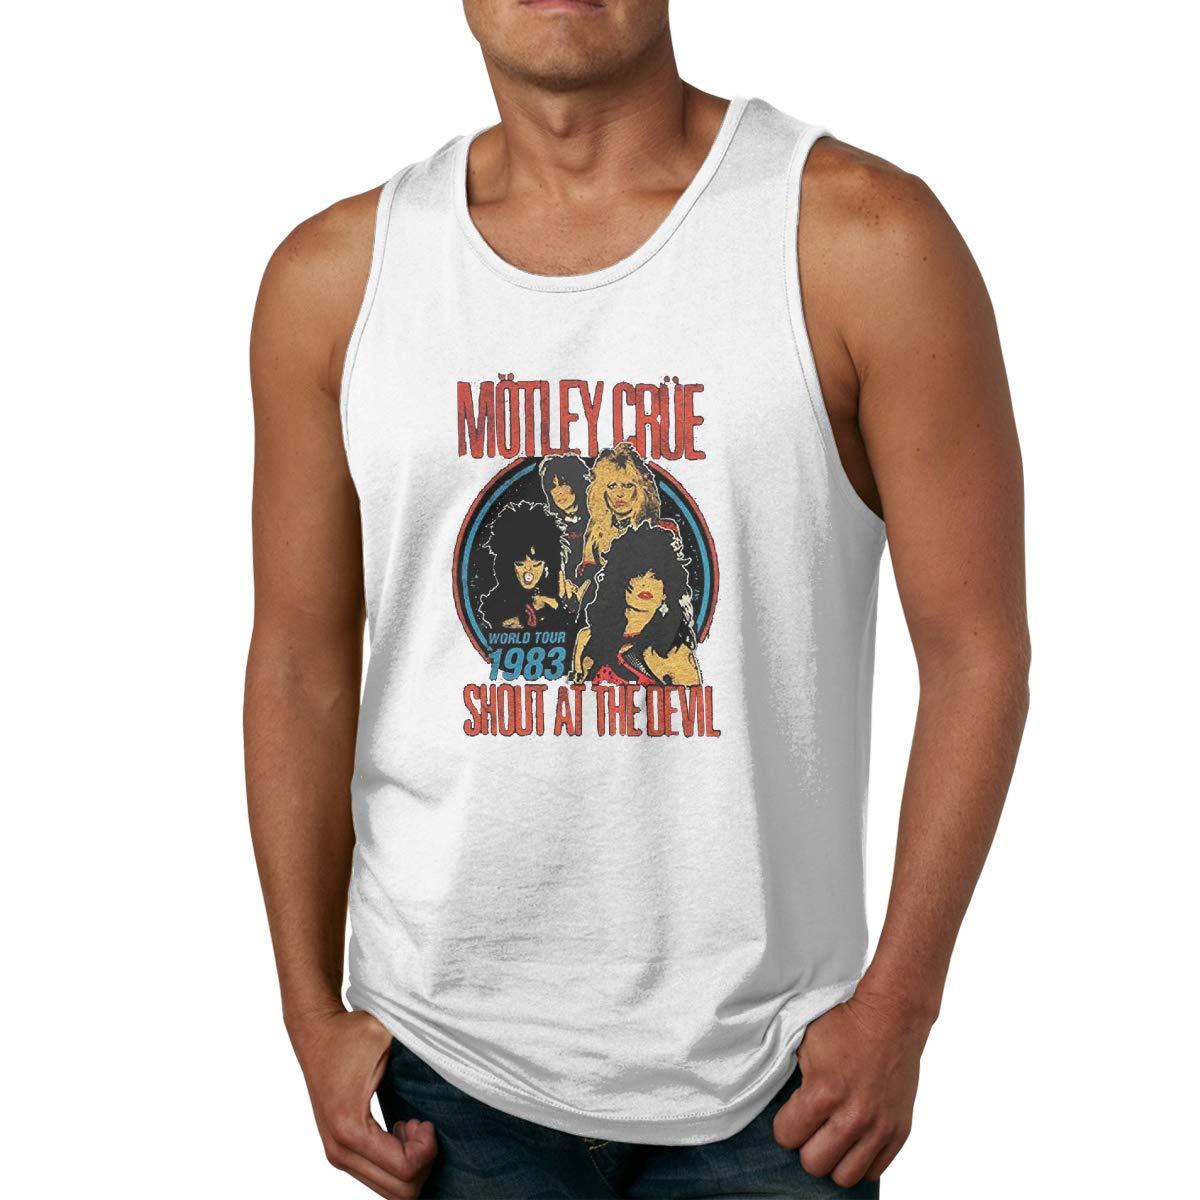 Motley Crue Vintage Shout At The Devil S Tank S 3 Shirts